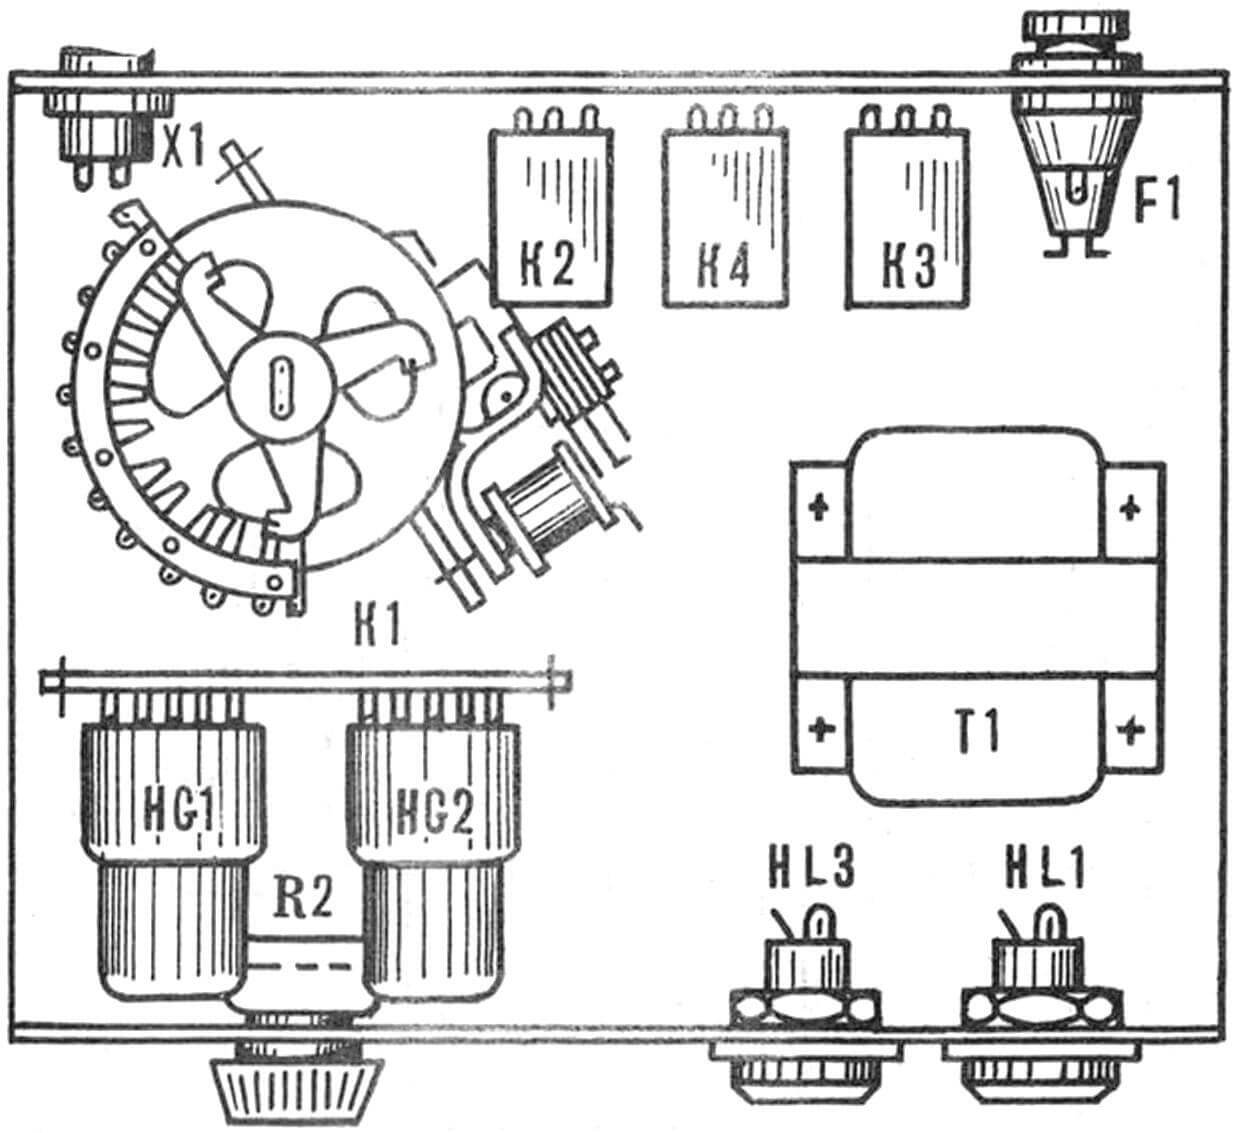 Компоновка прибора в корпусе (SA1, SB1 и HL2 условно не показаны).